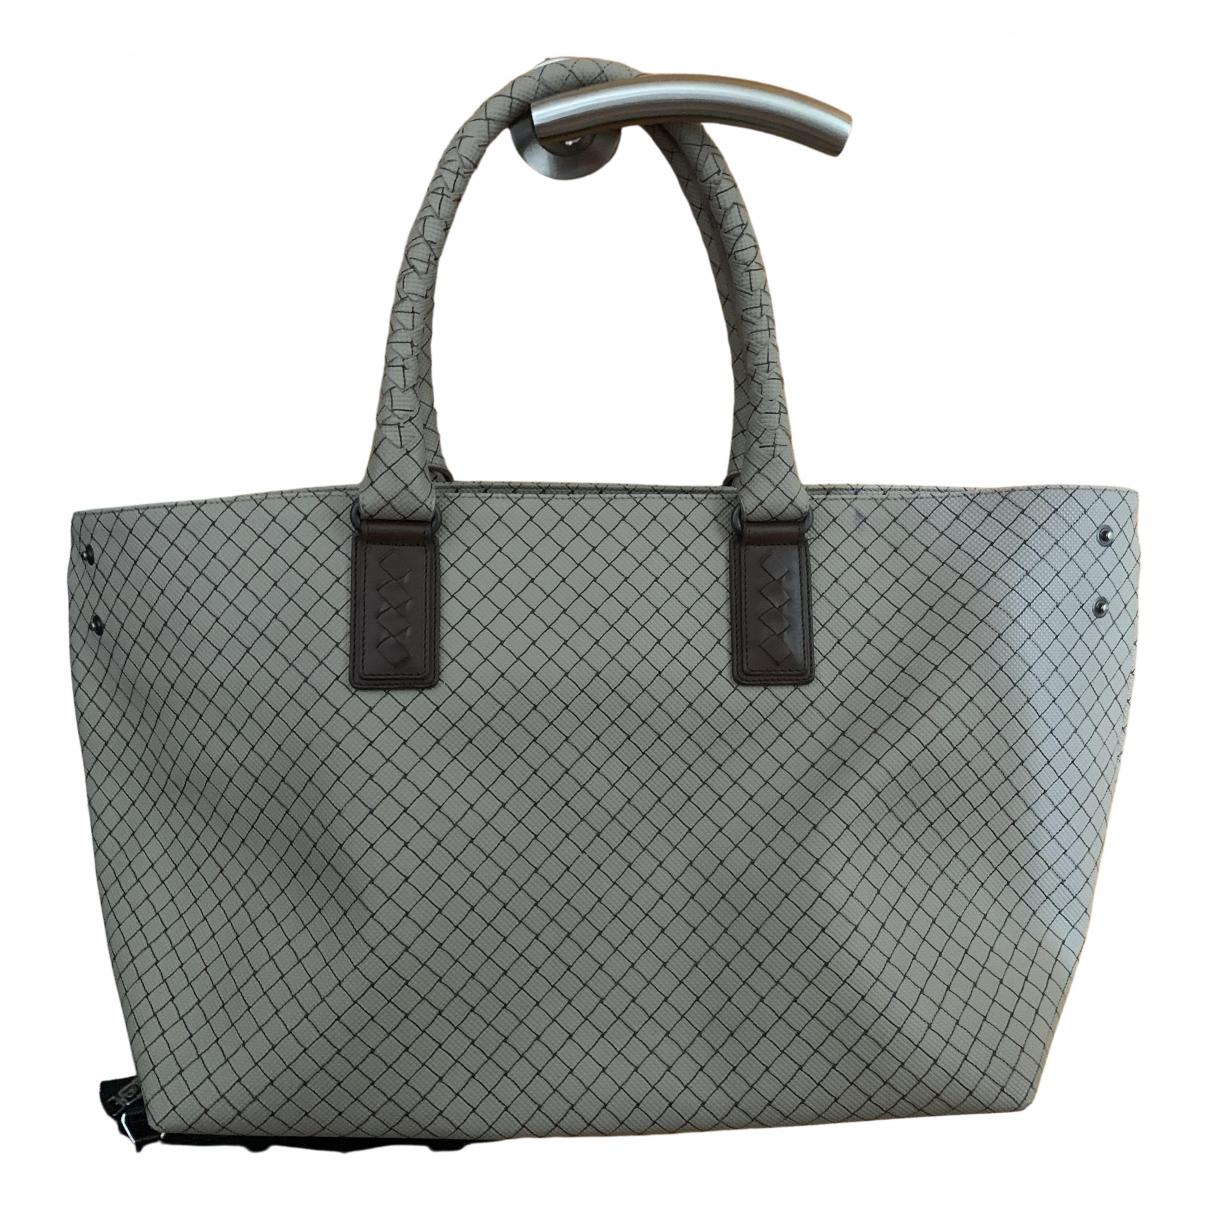 Bottega Veneta \N Grey handbag for Women \N